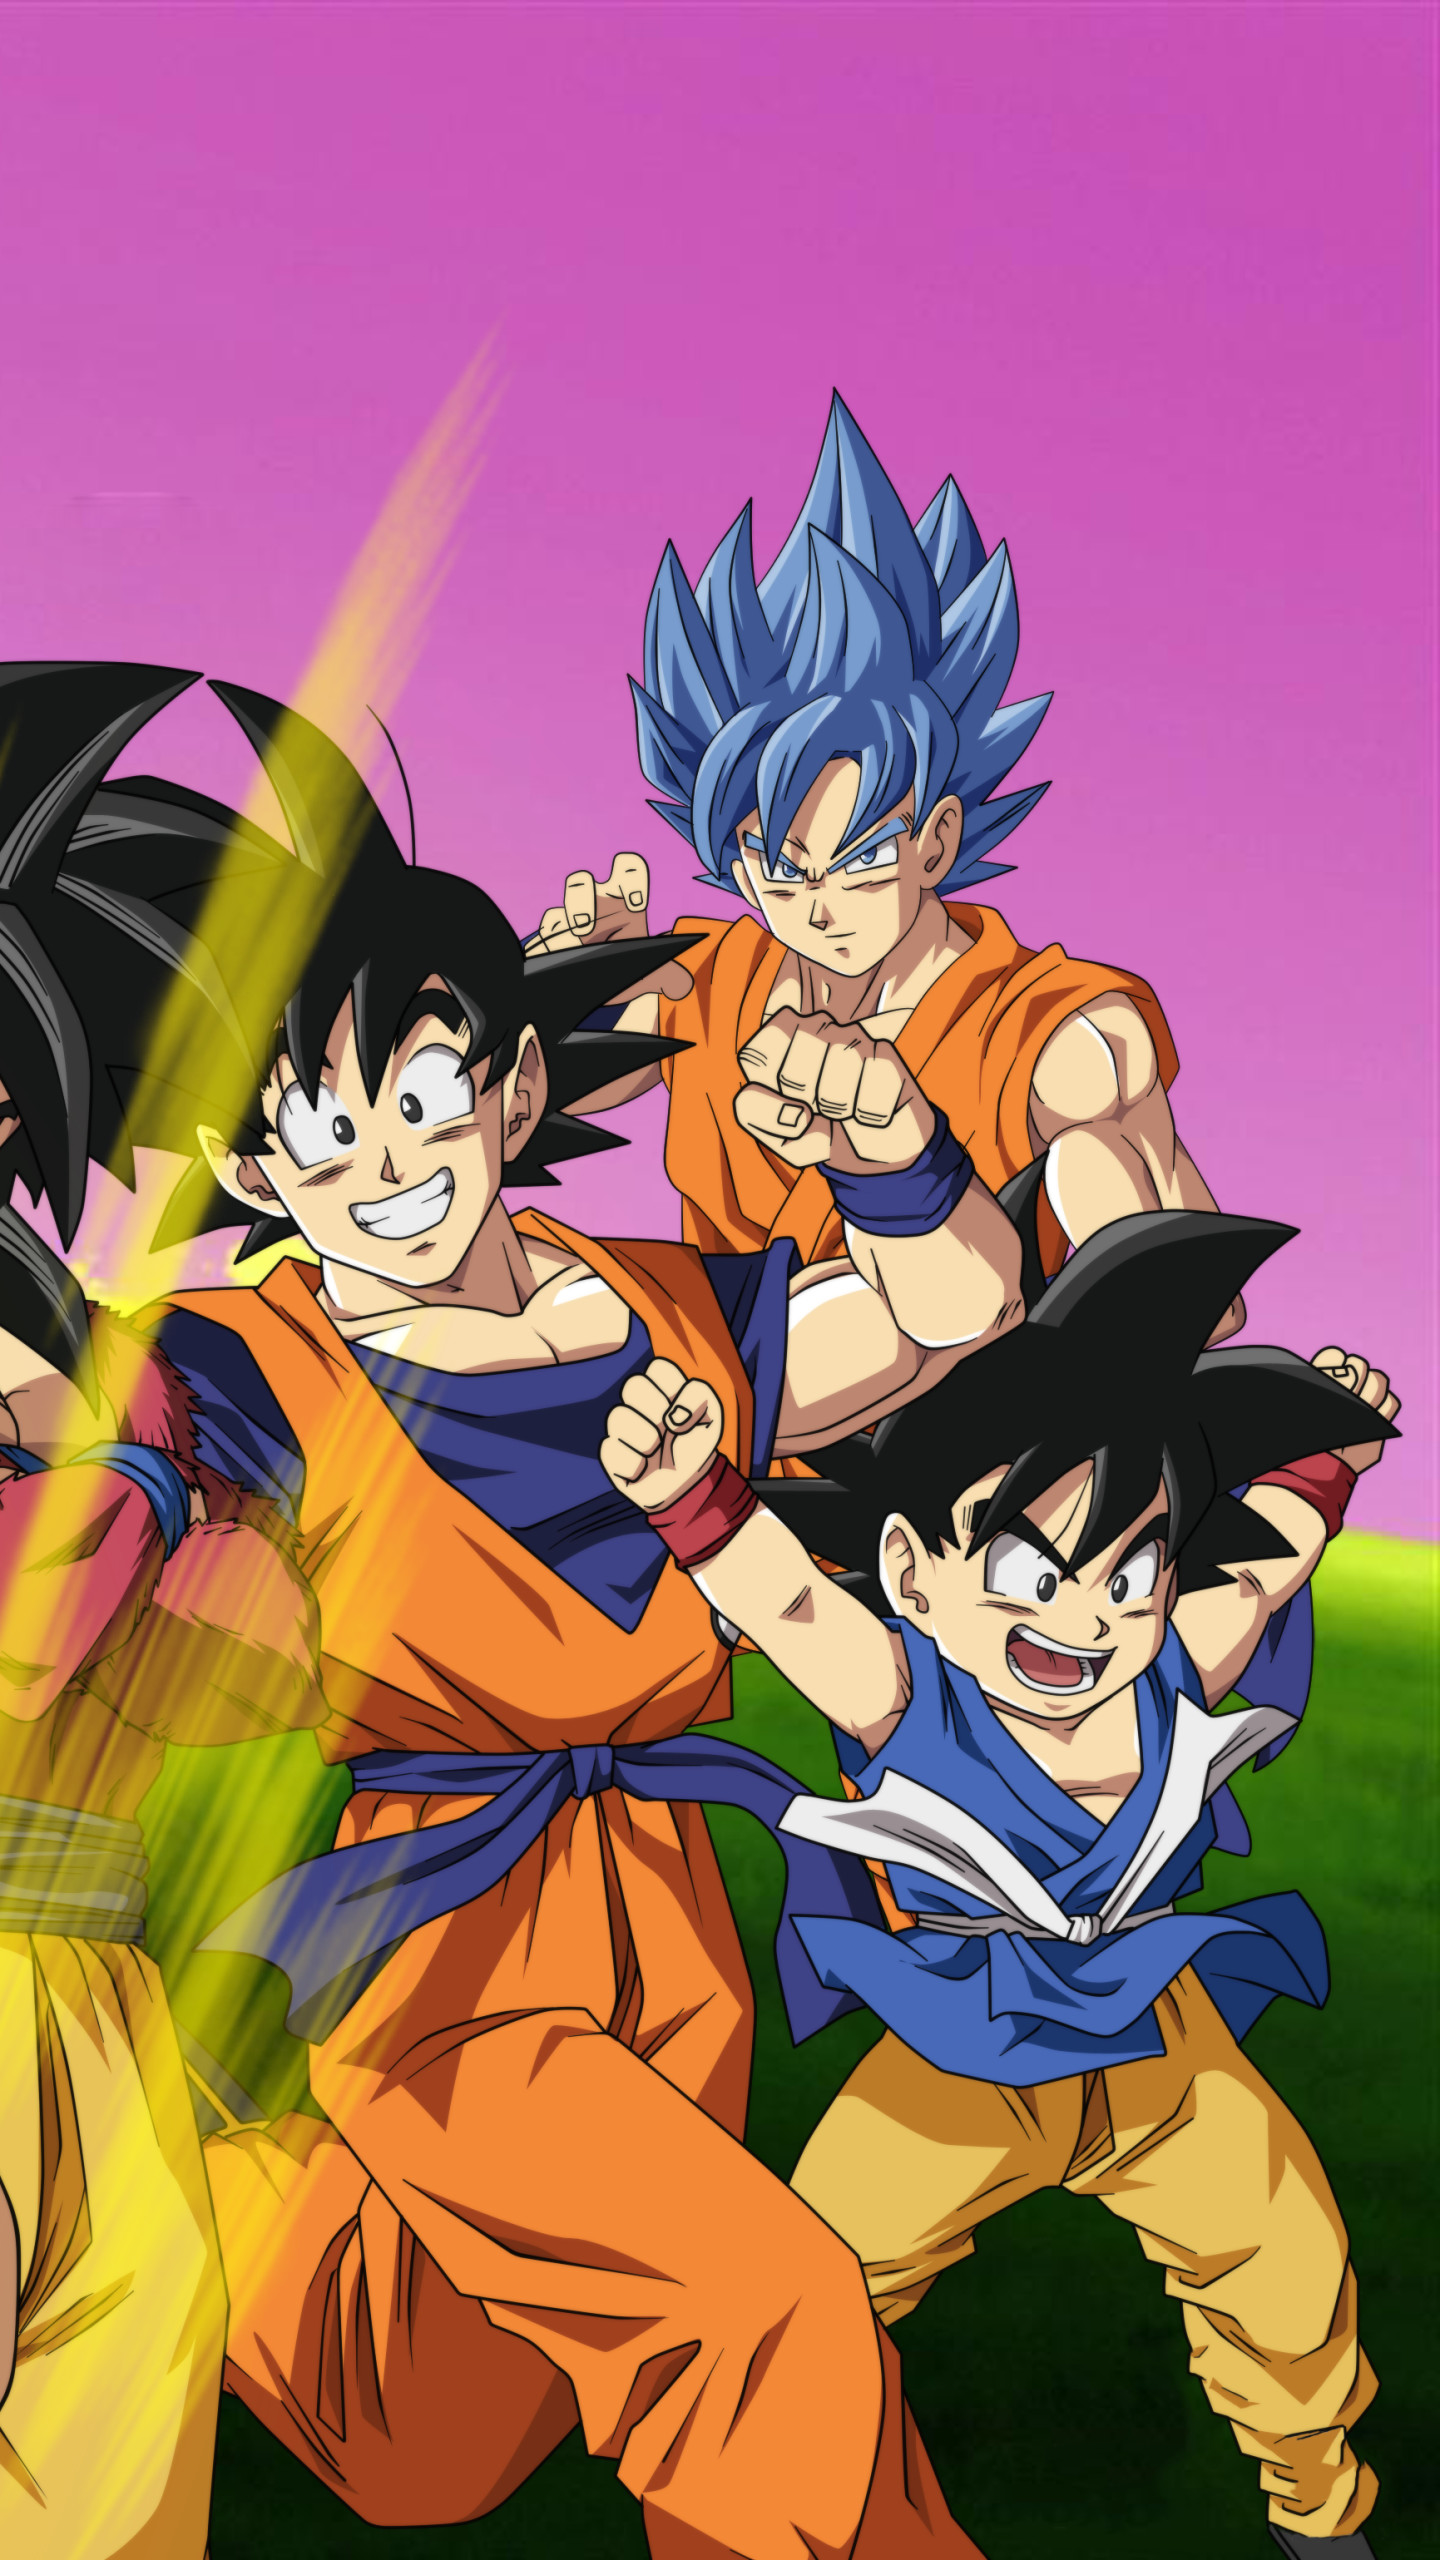 Dragon Ball Z Kakarot guide: 6 things we wish we knew in